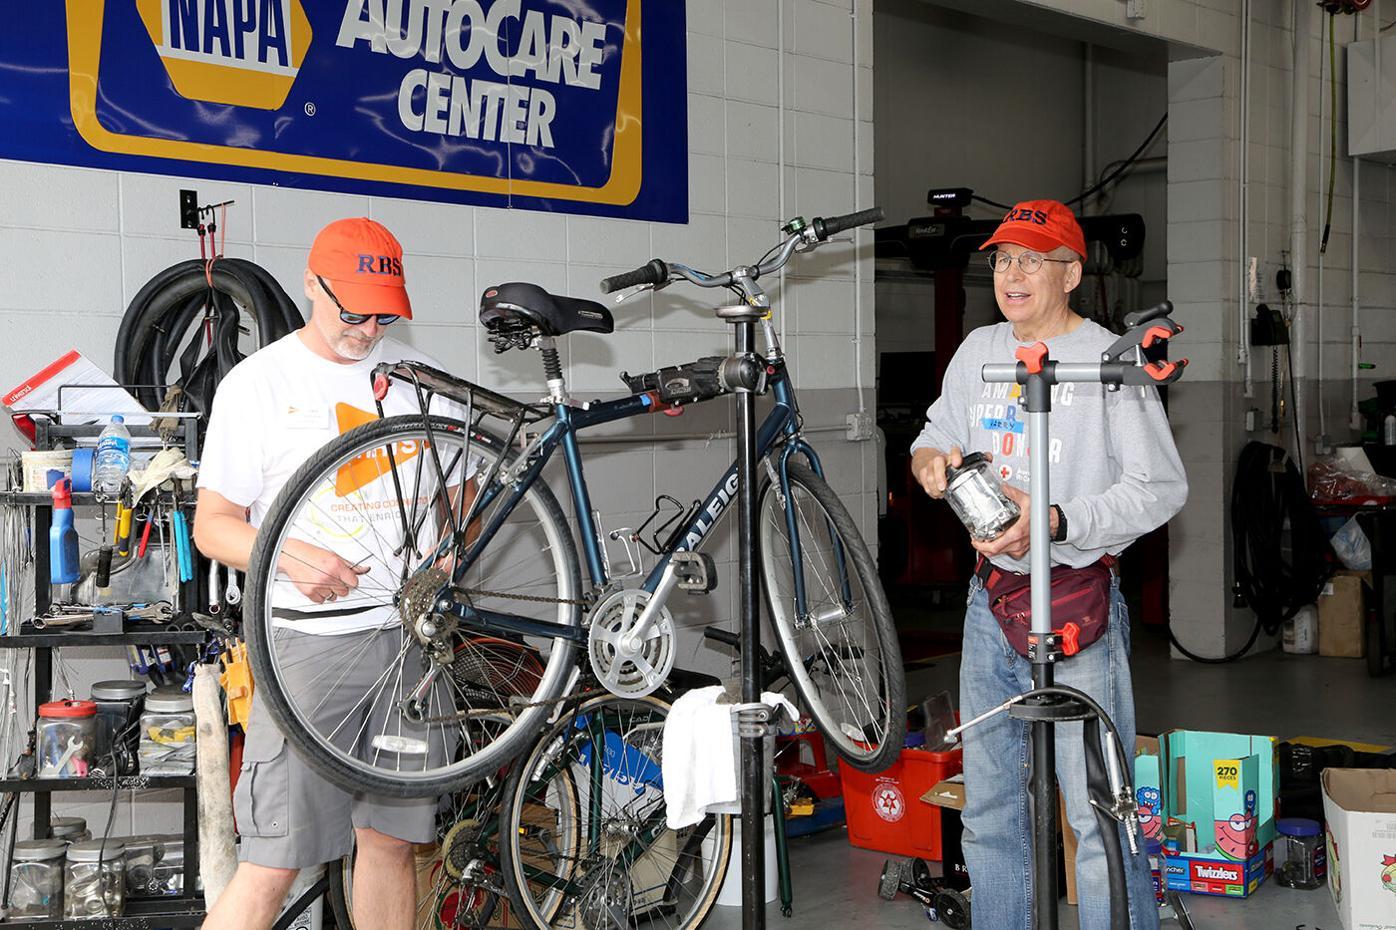 av rick's bike sale 2 web.jpg